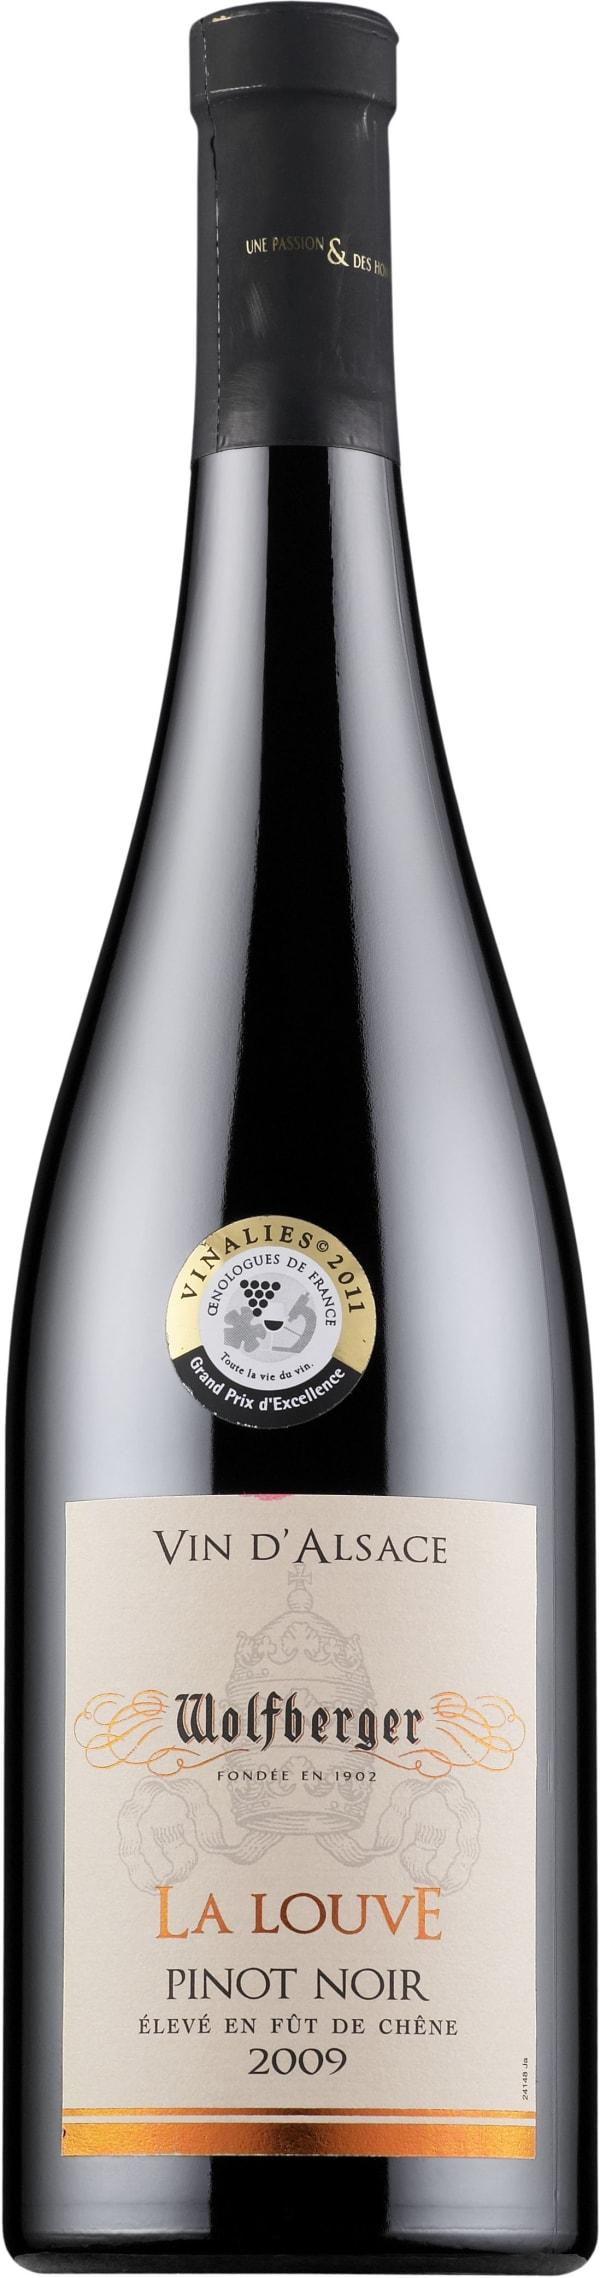 Wolfberger La Louve Pinot Noir 2016